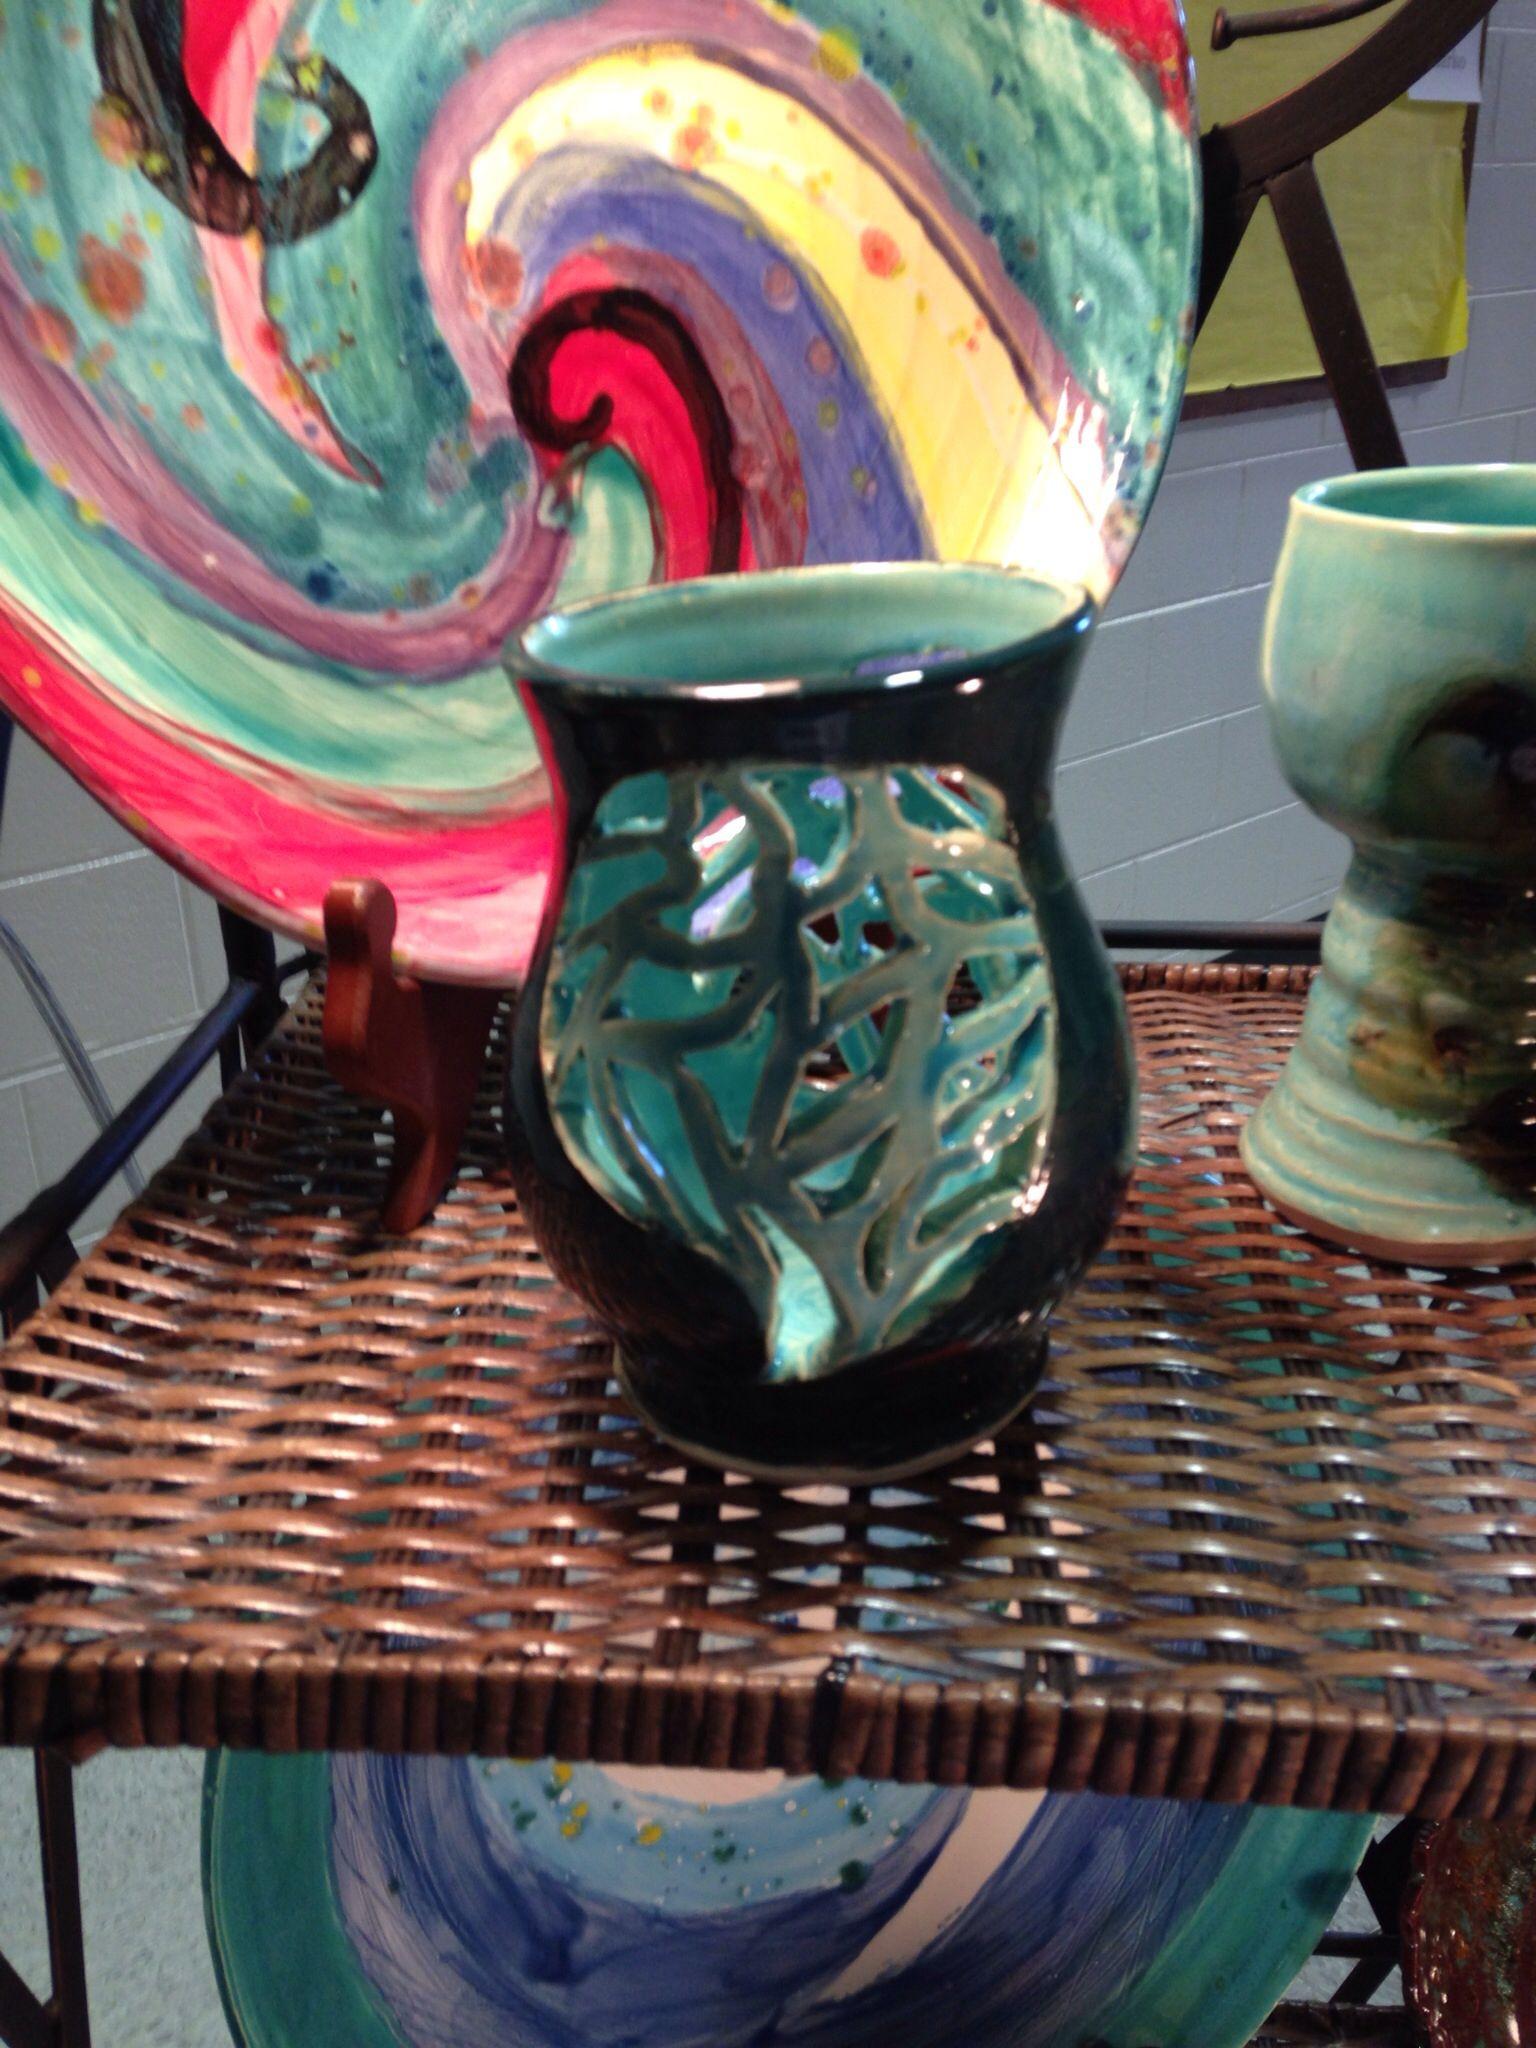 Cemetery Vases Metal Of Pierced Teal Vase Pottsability Pottery Pinterest Pottery for Pierced Teal Vase